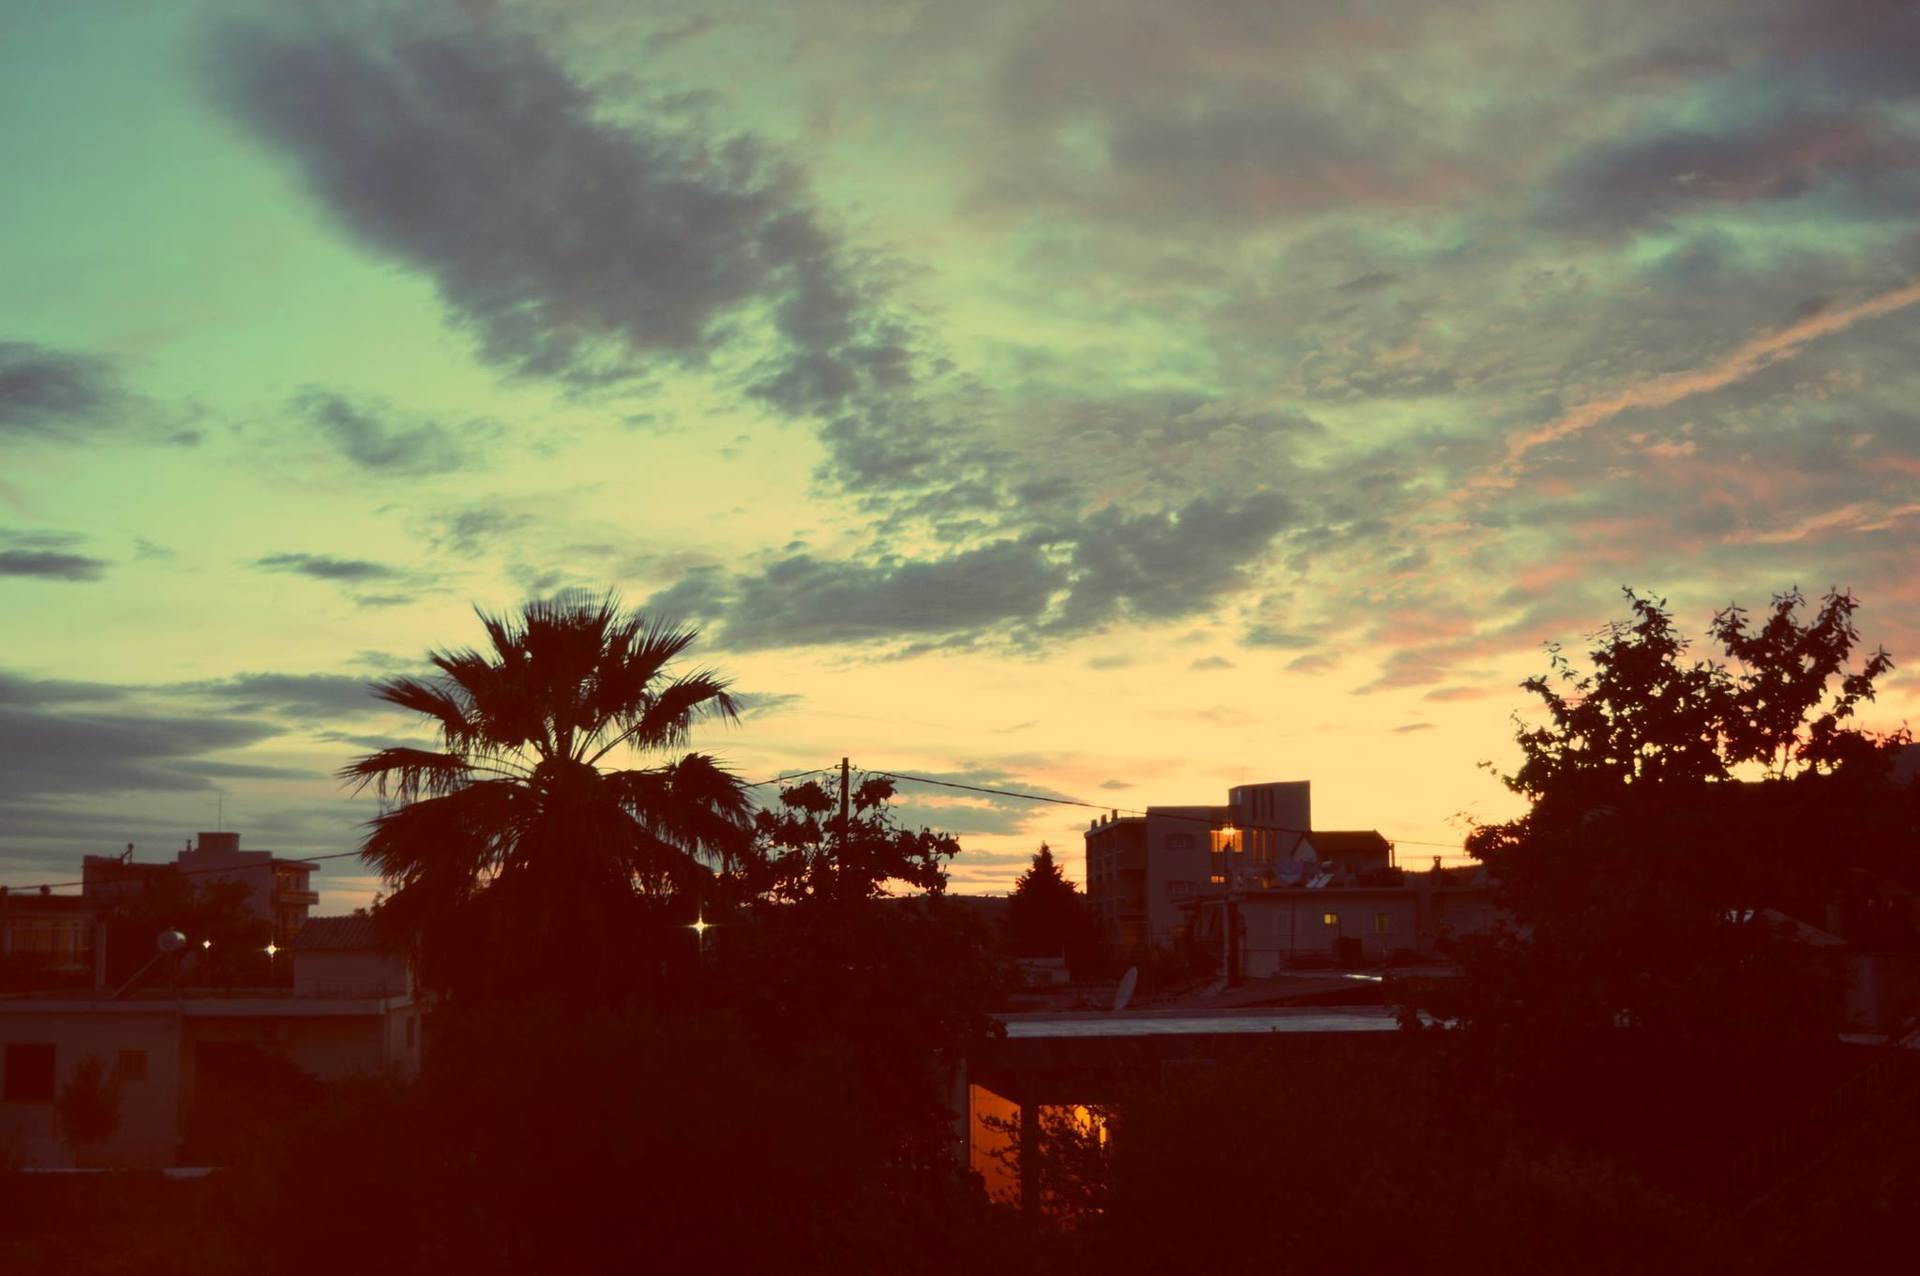 sunset | no person, evening, dawn, dusk